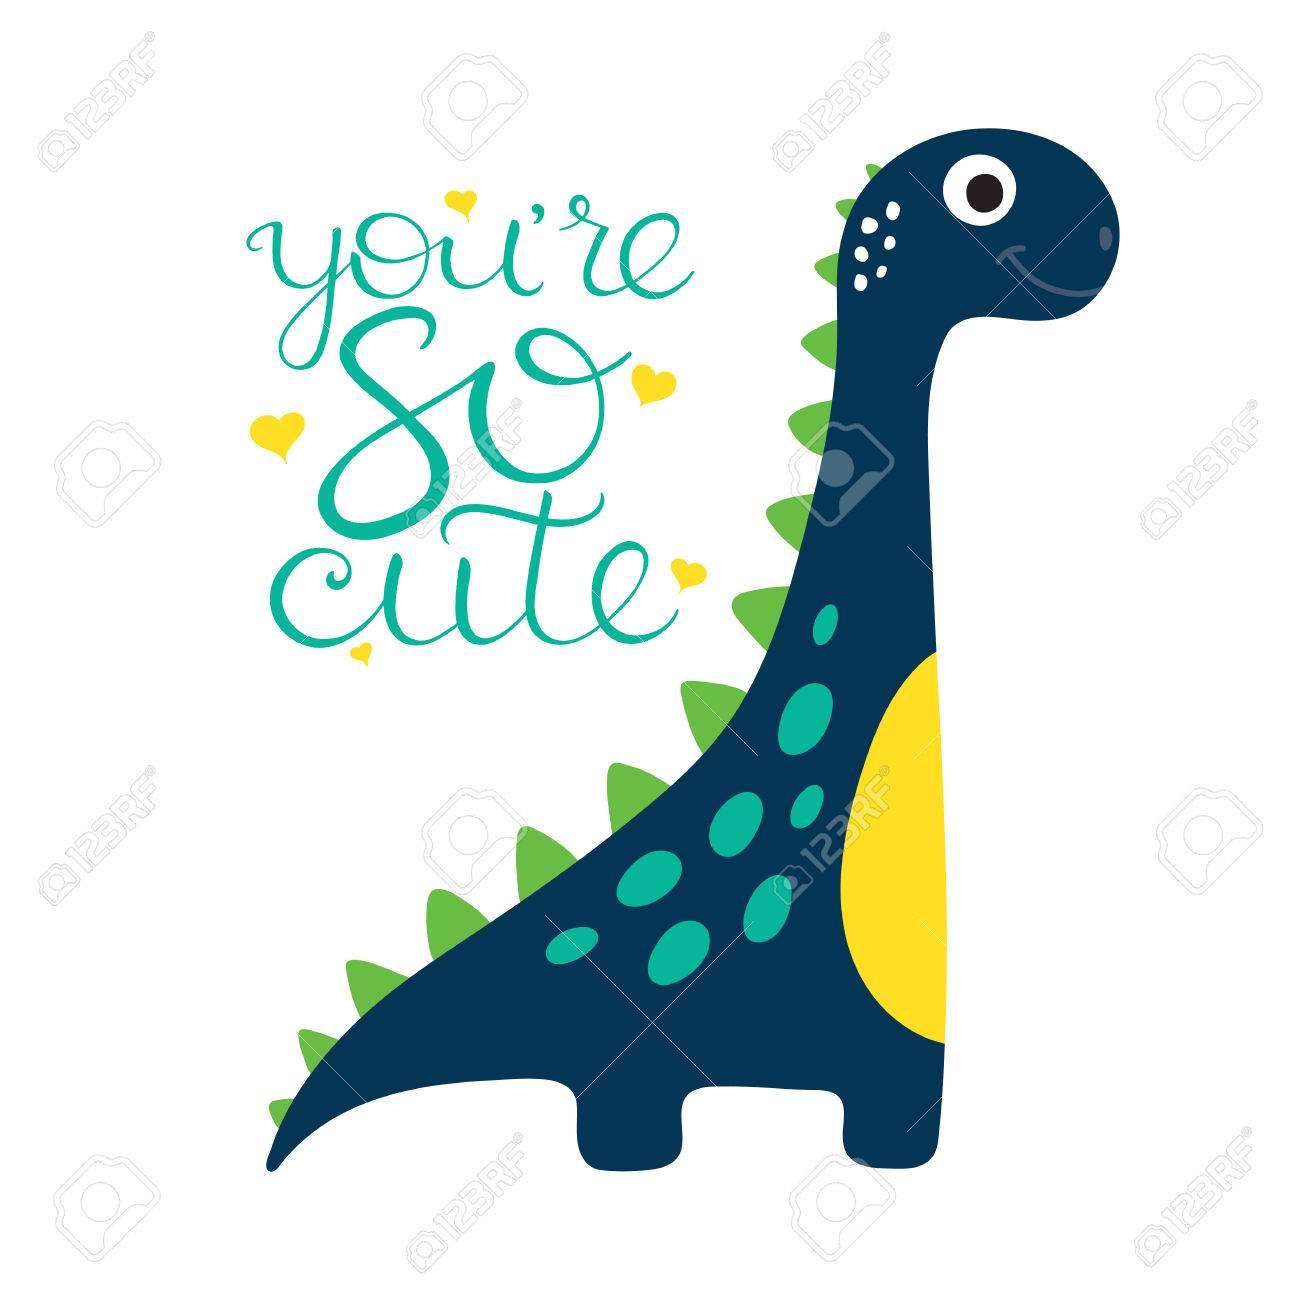 Image of: Rawr Cute Cartoon Dino Illustration You Are So Cute Stock Vector 84969242 123rfcom Cute Cartoon Dino Illustration You Are So Cute Royalty Free